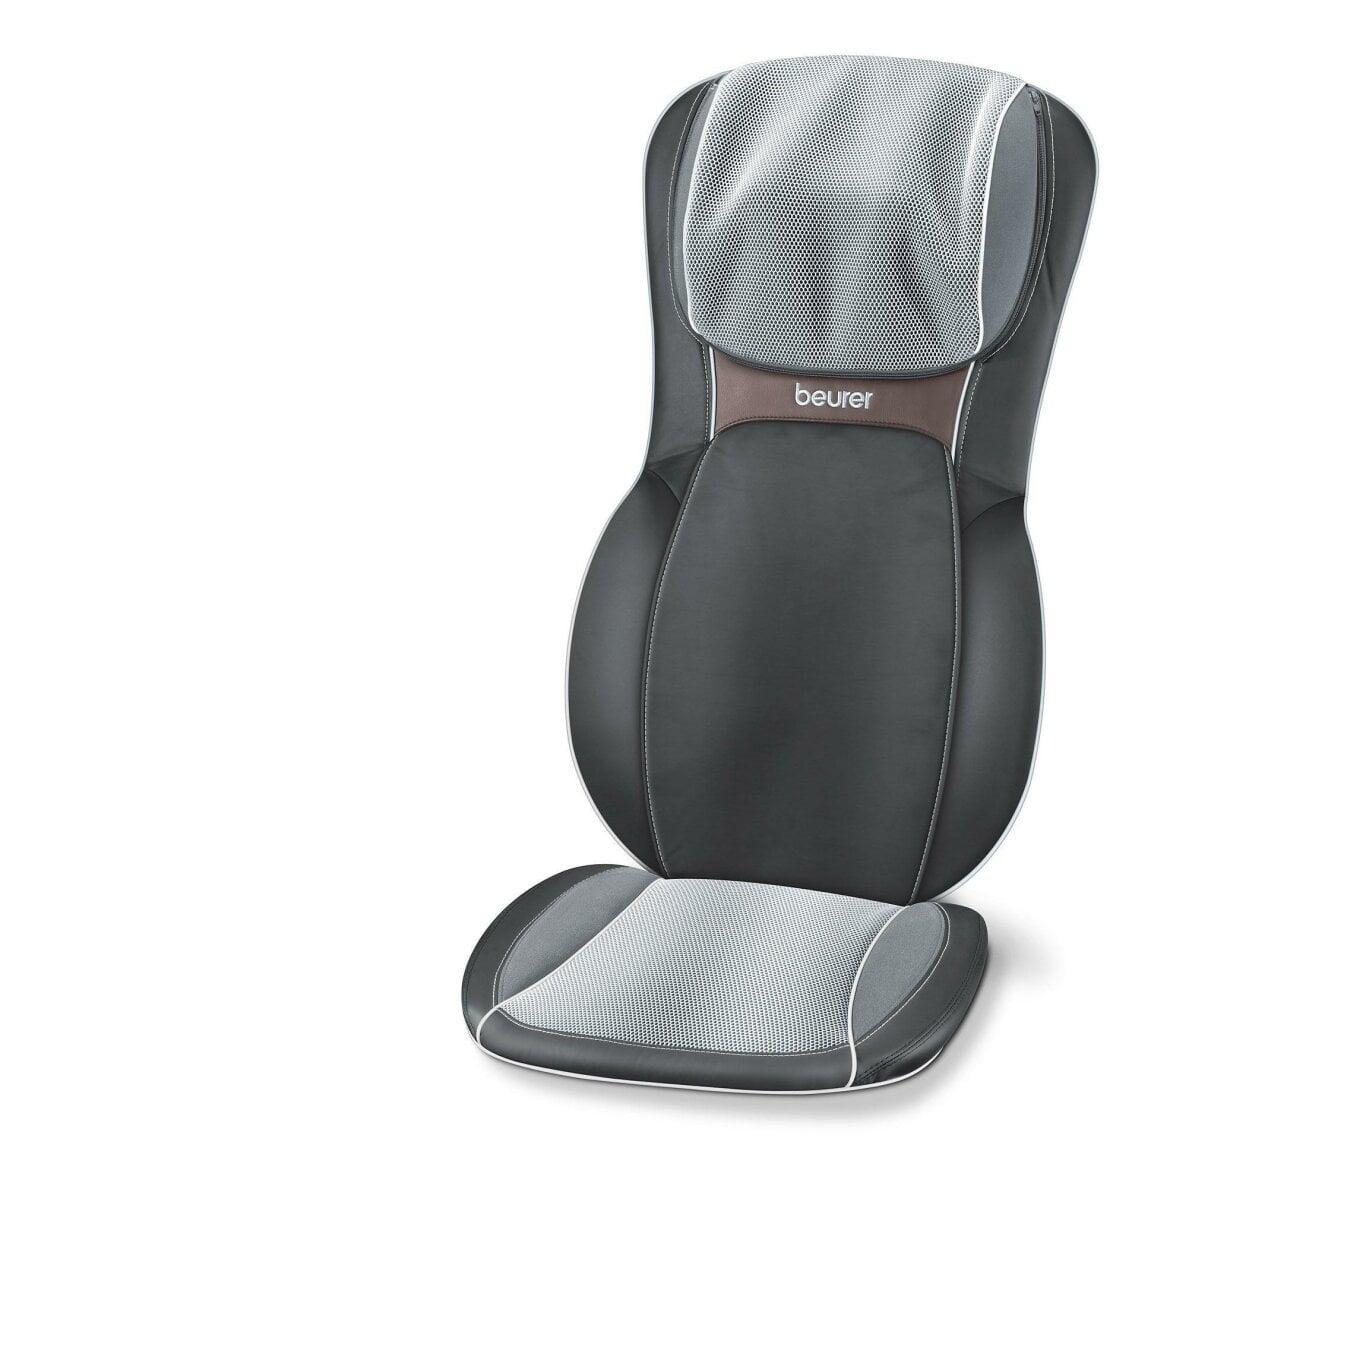 Beurer Shiatsu-Sitzauflage - MG 295 - HD 3D_black